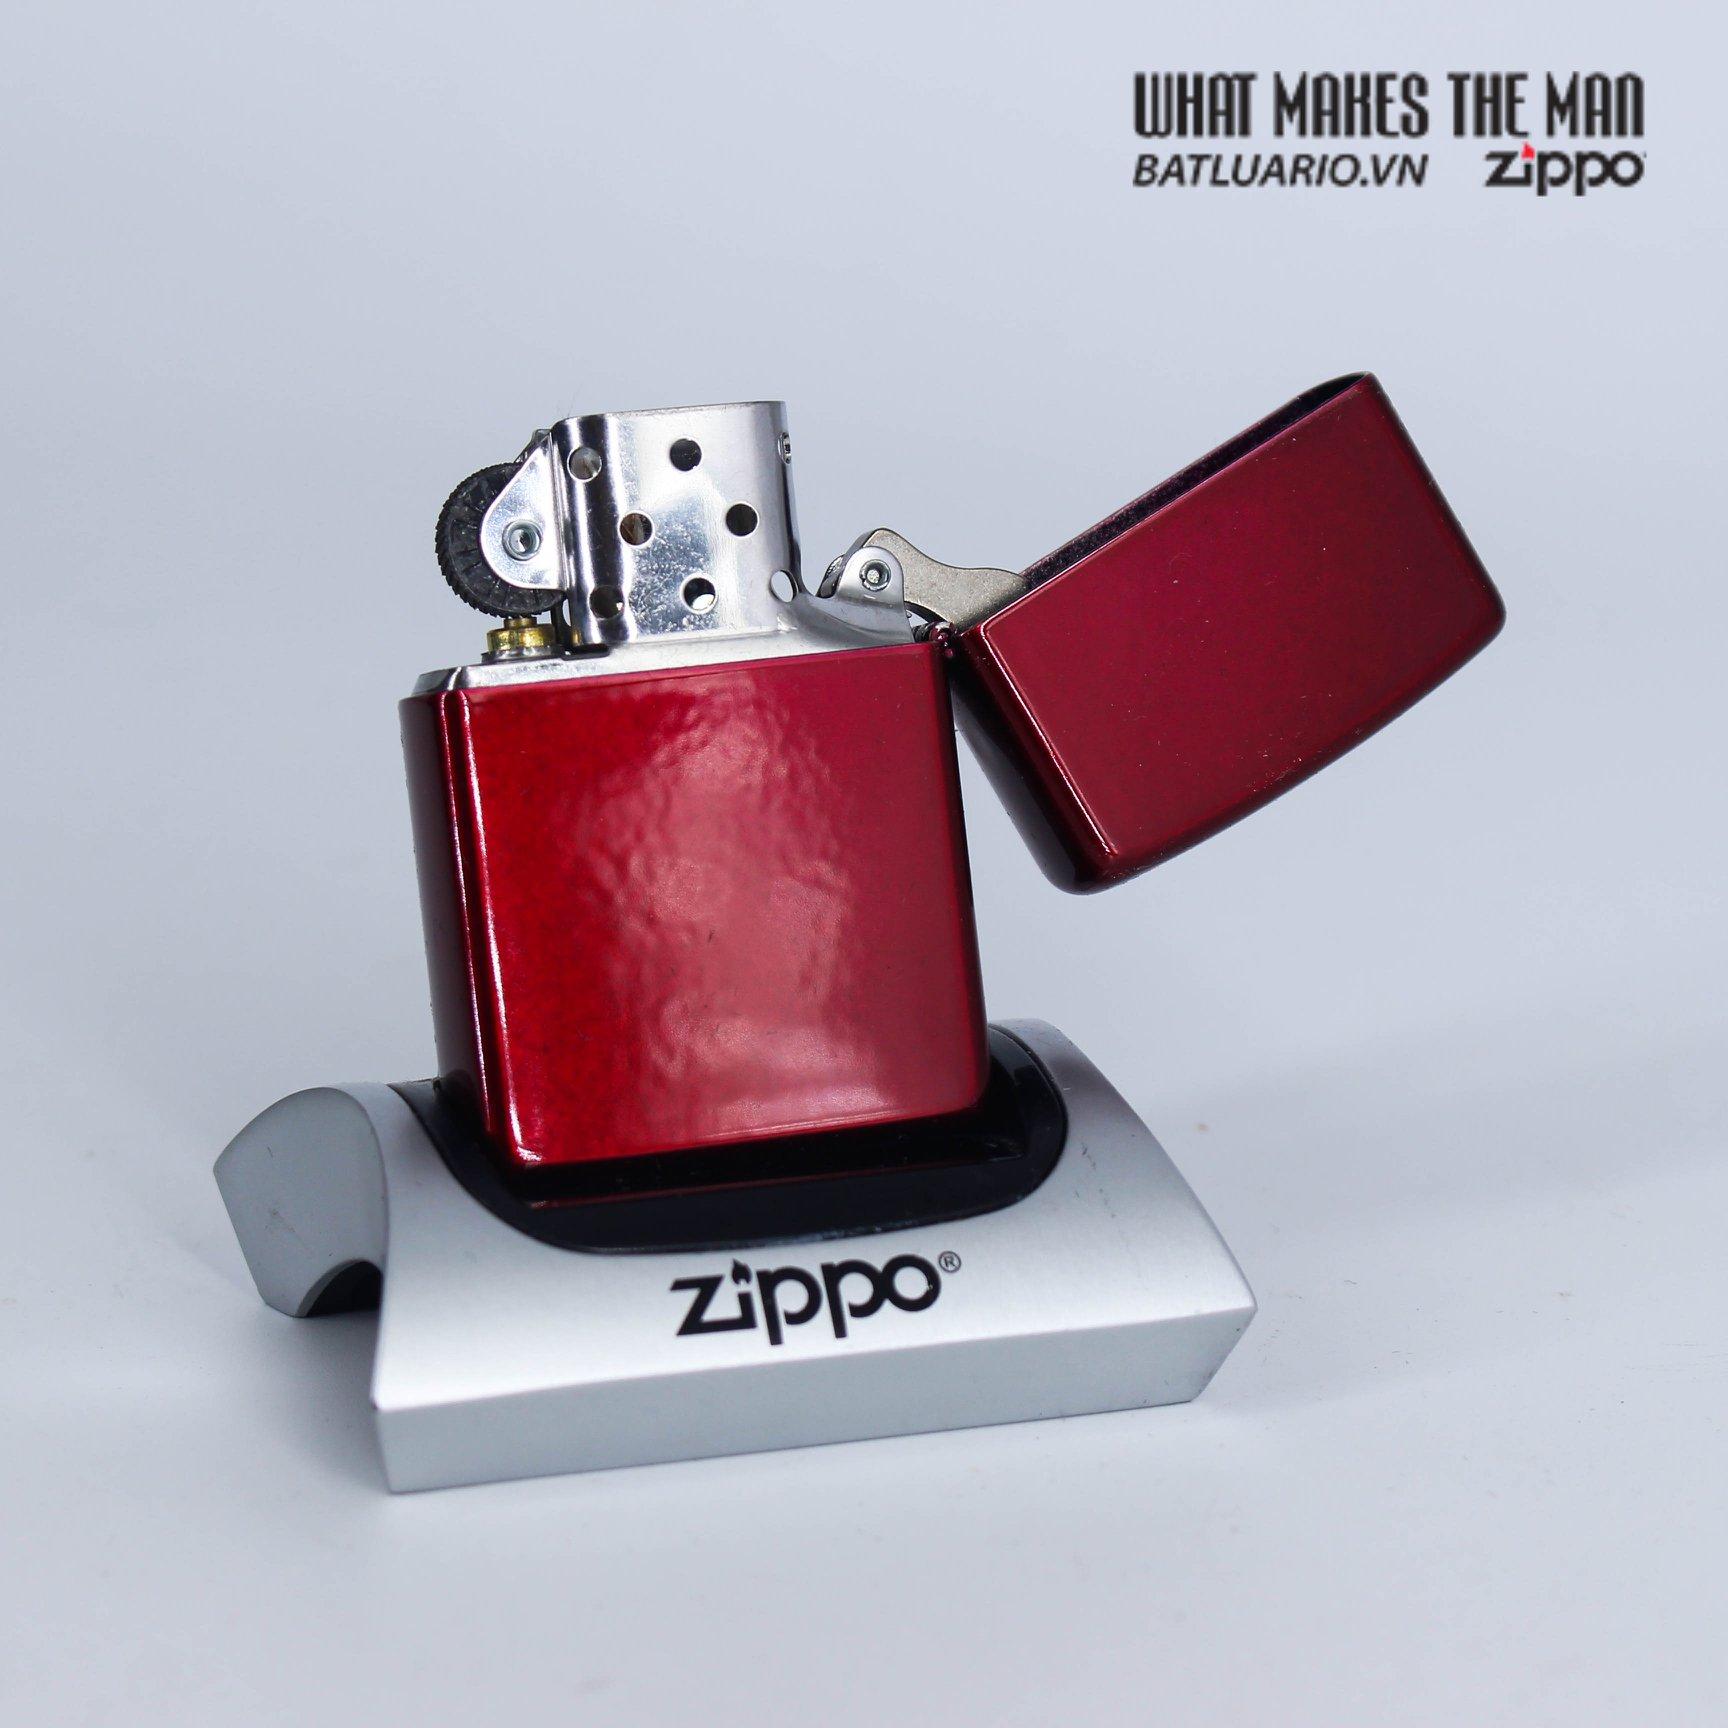 Zippo 49109 - Zippo Lion Tattoo Design Candy Apple Red 3